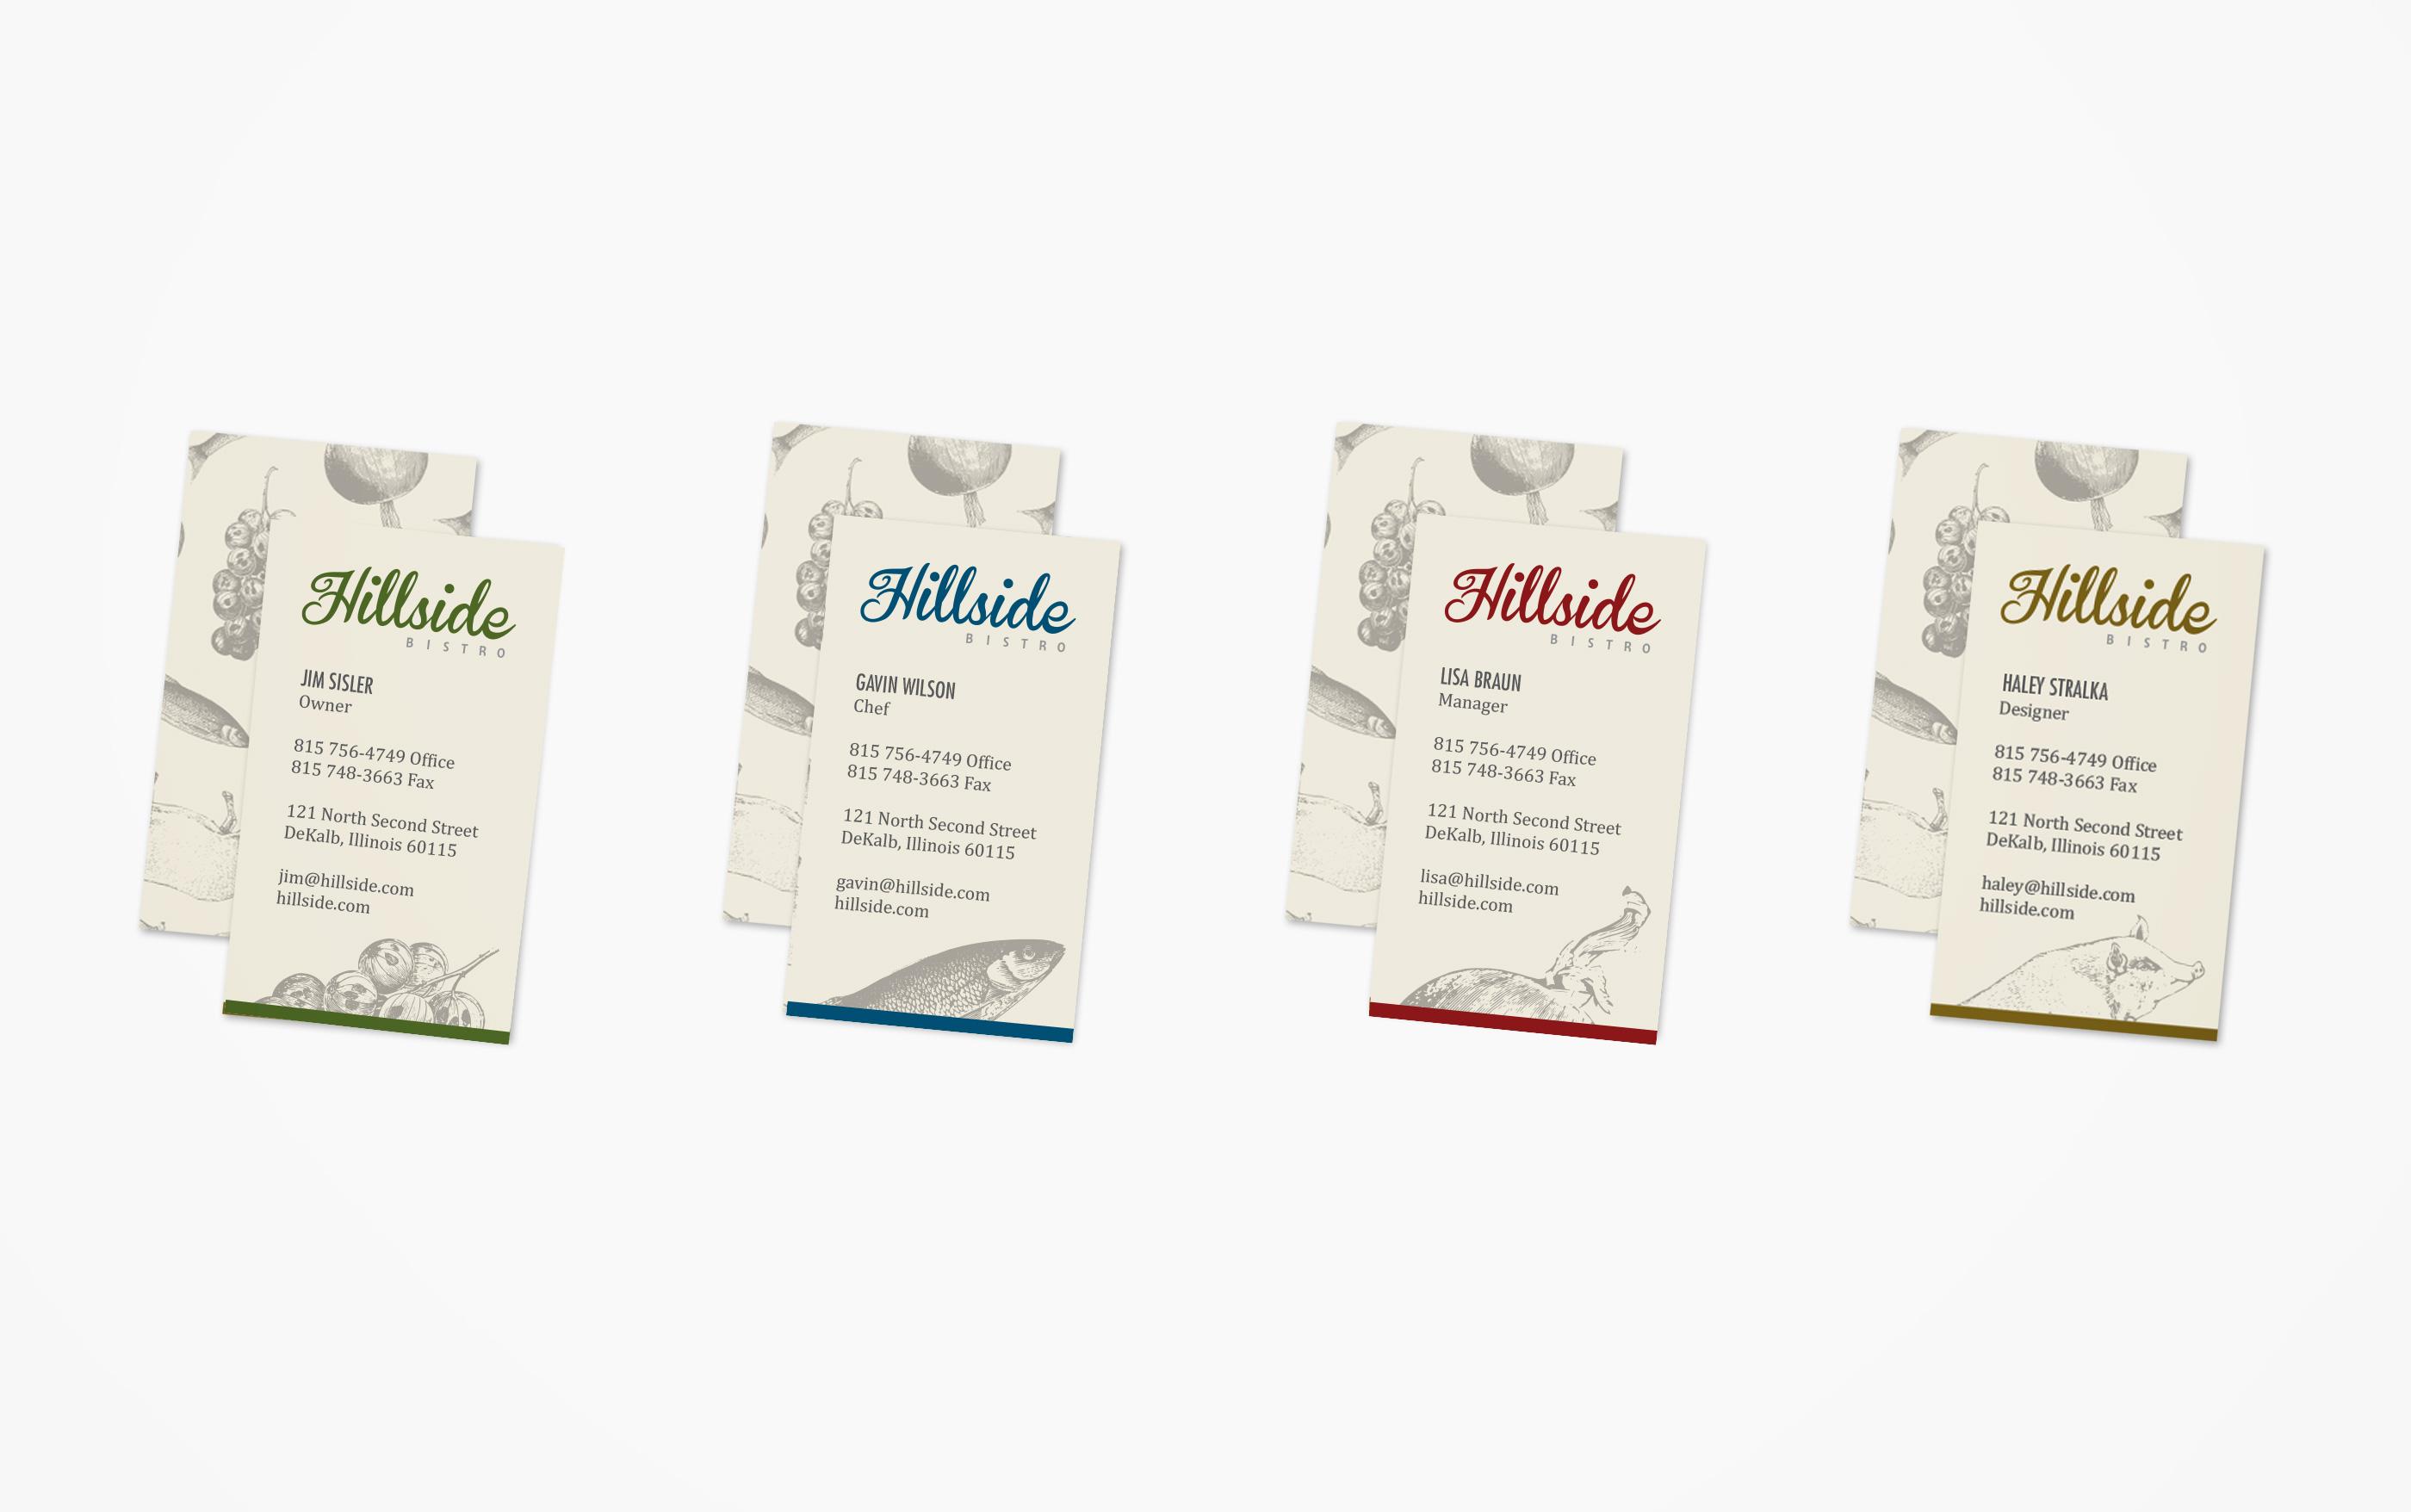 Hillside Restaurant Business Cards